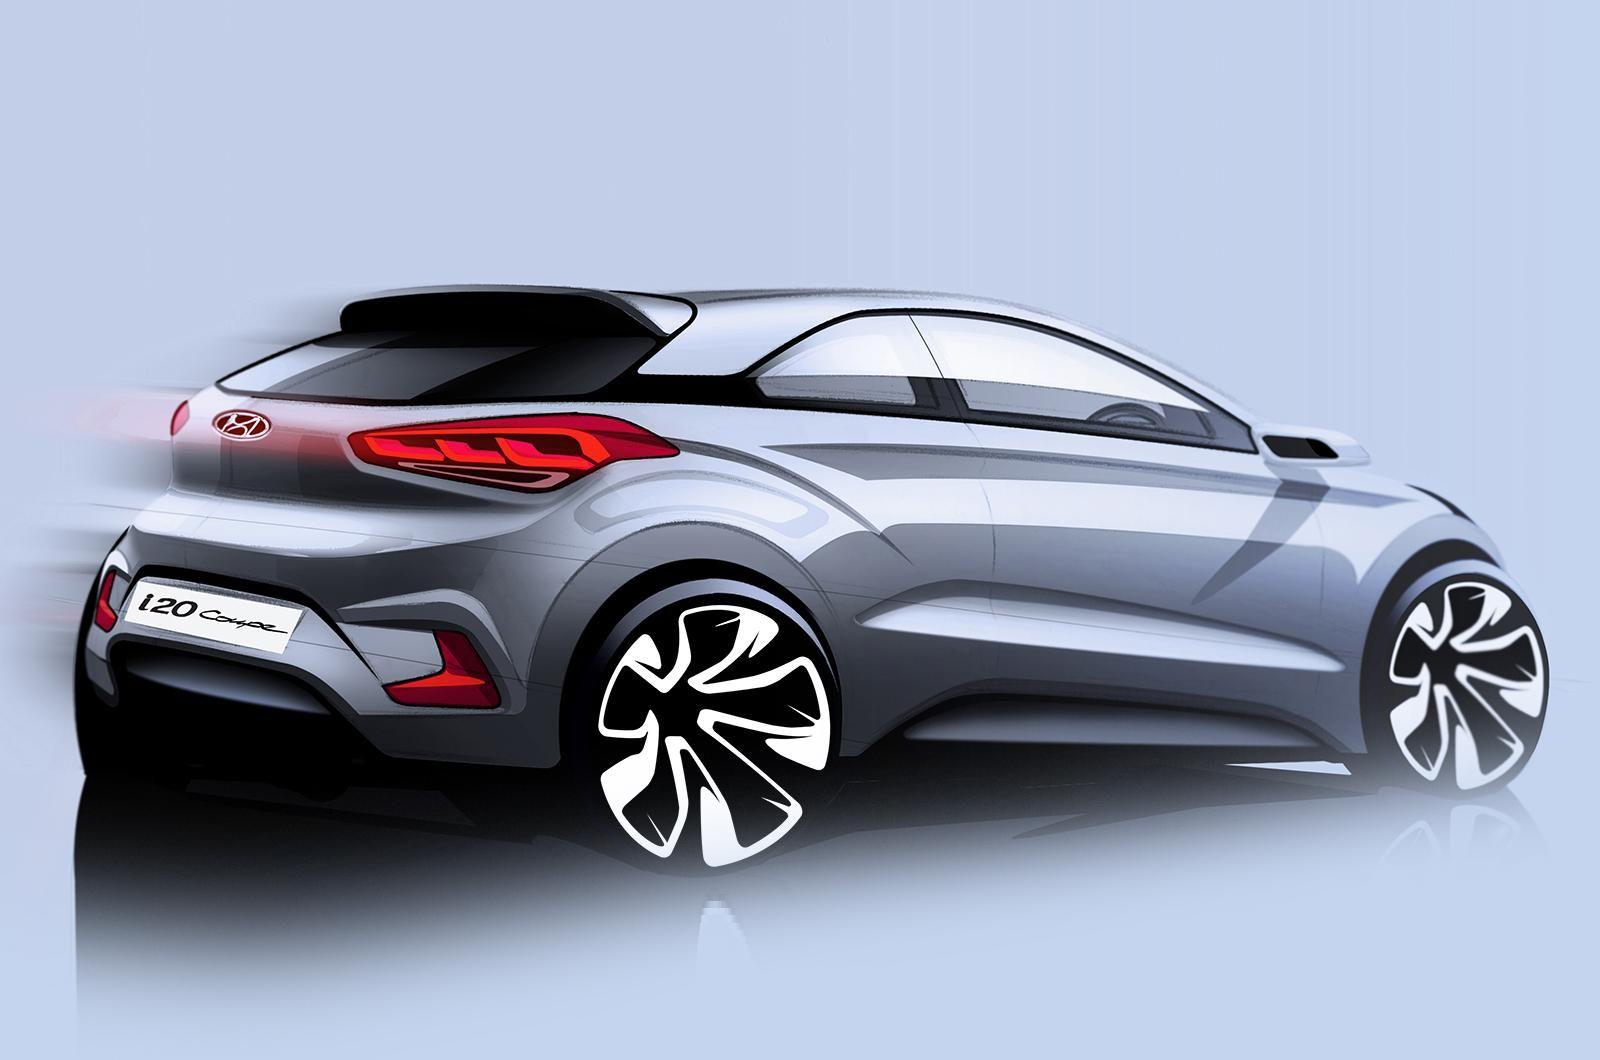 Hyundai I20 Coupe Teaser Sketch Hyundai New Hyundai Coupe